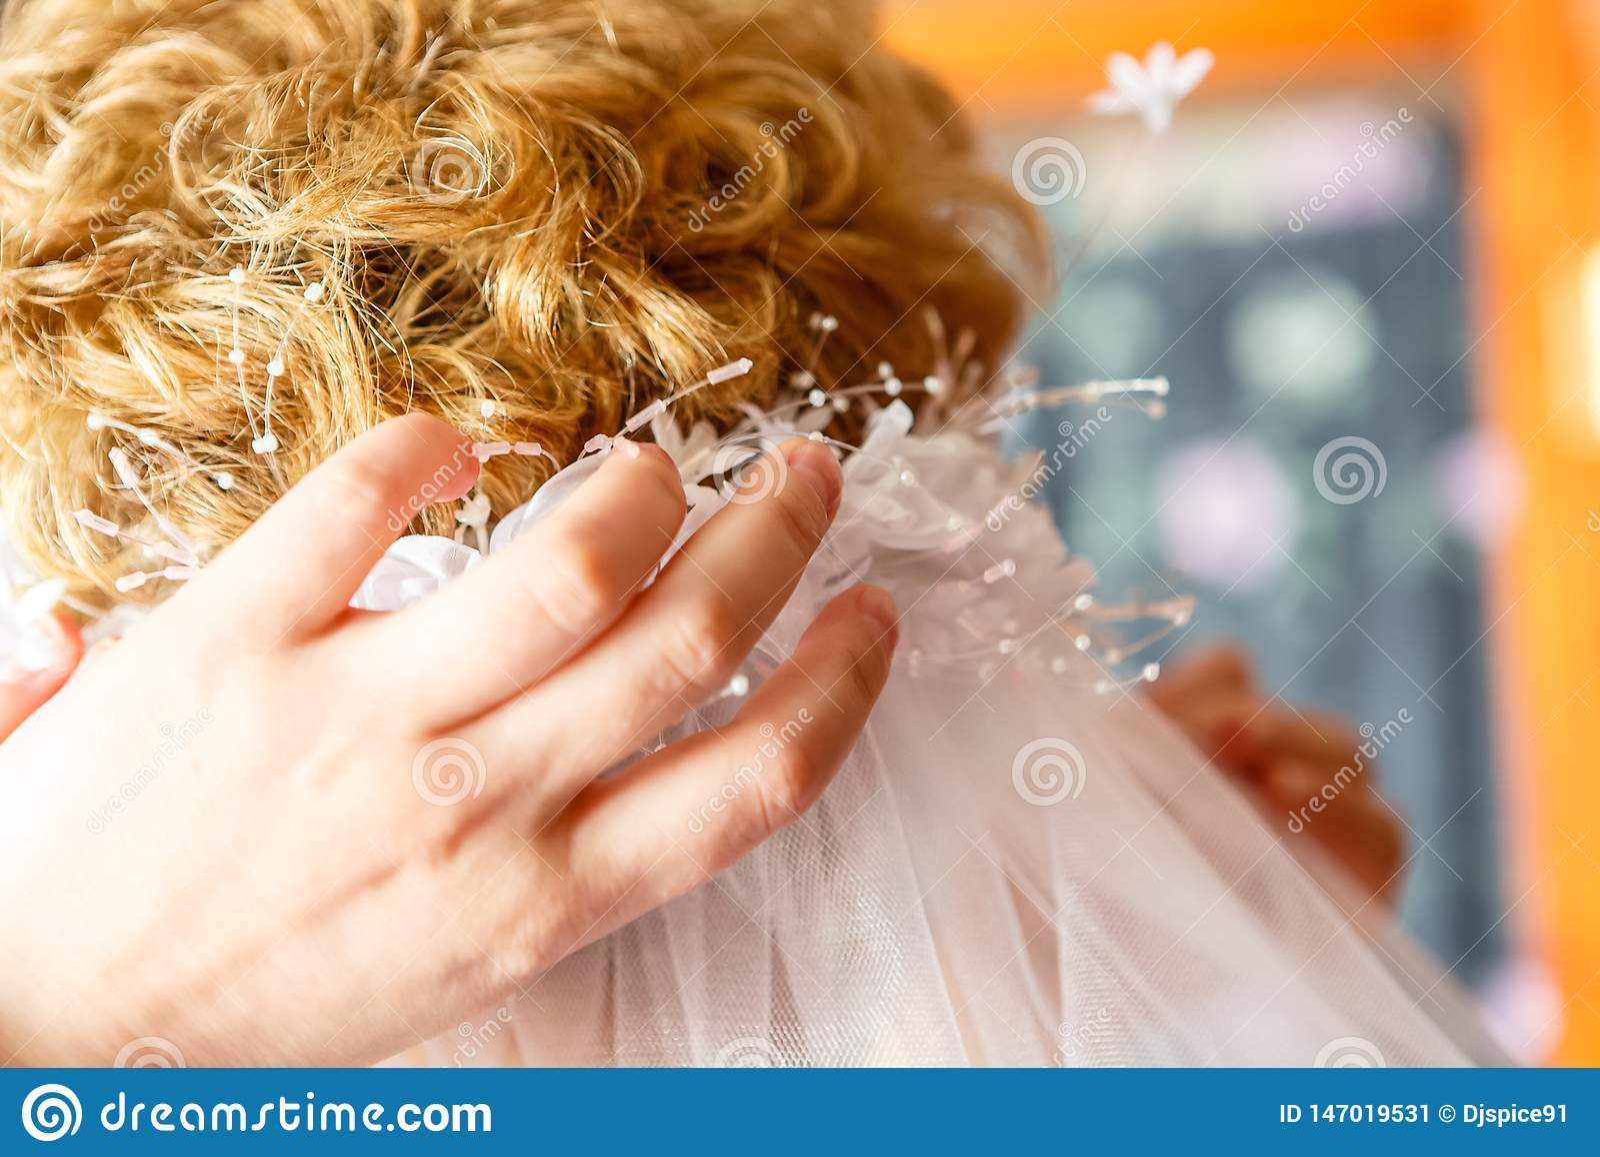 La mamá lleva el velo de novia de la hija